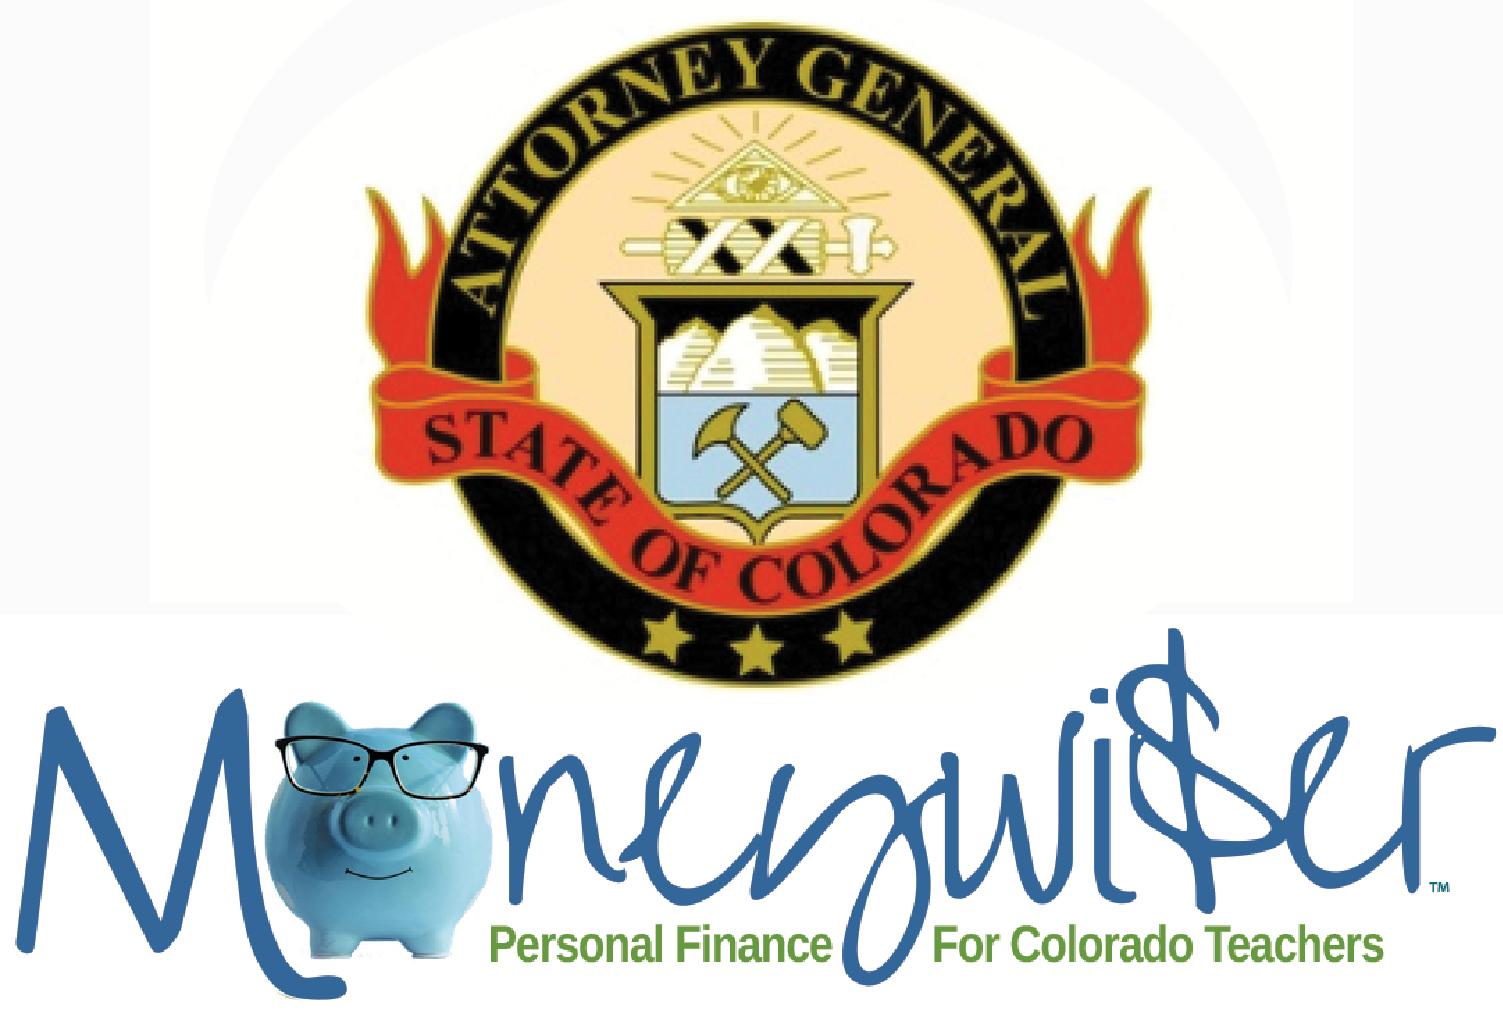 ag moneywiser dual v2.jpg